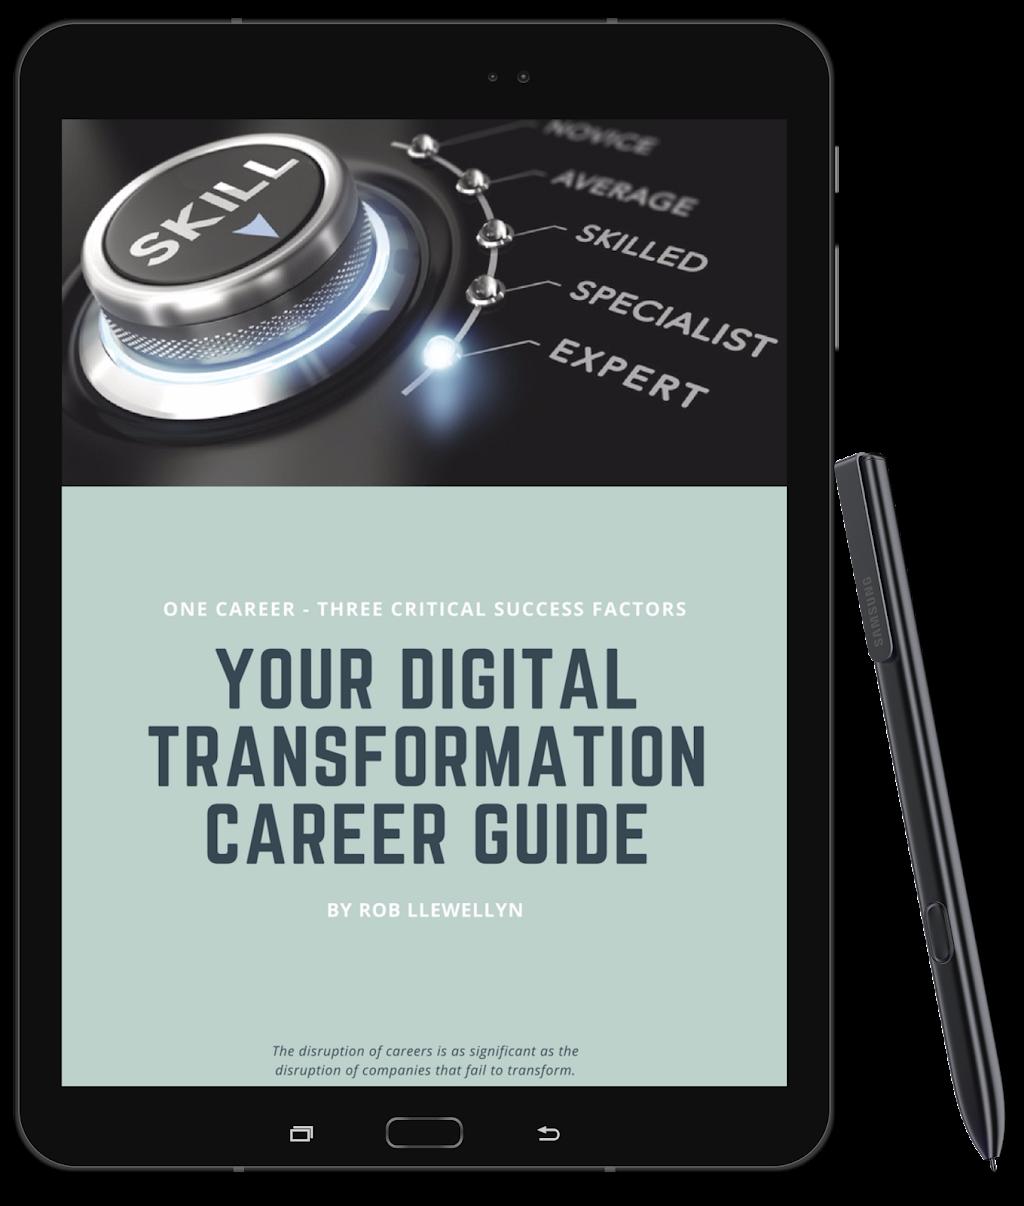 Digital Transformation Career Guide